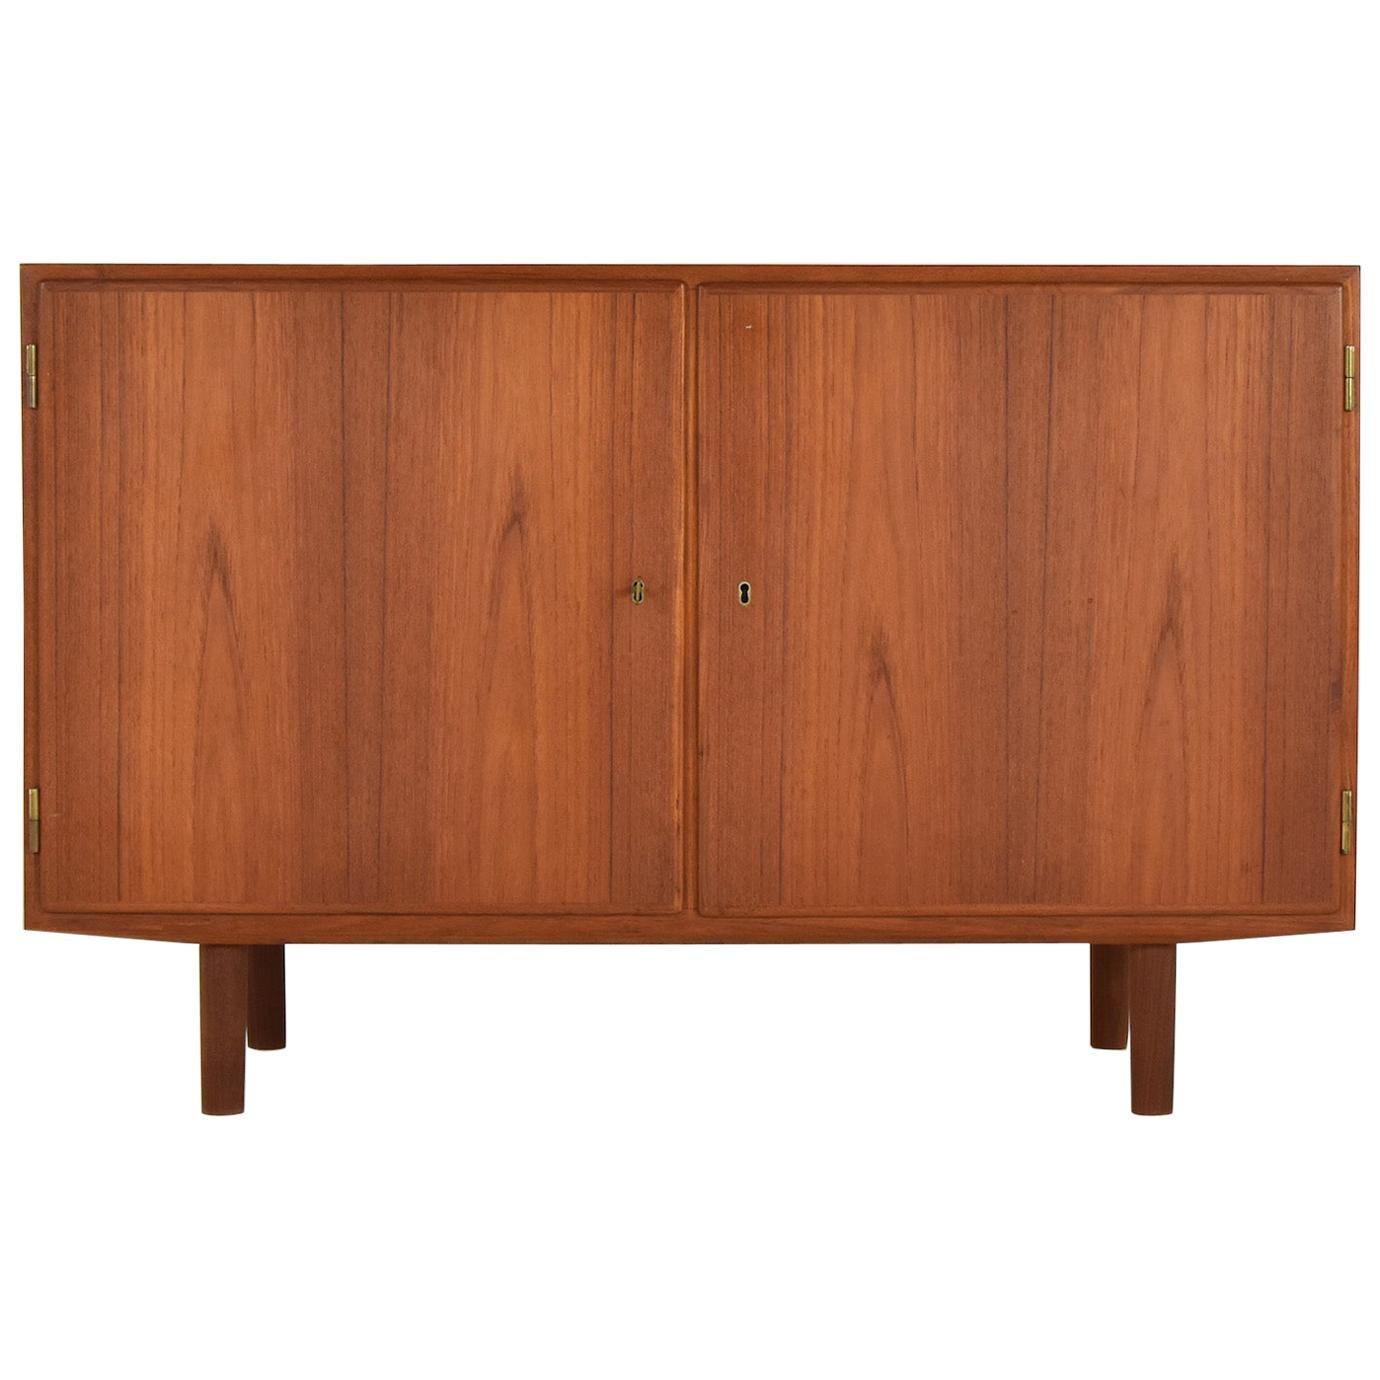 Cabinet in Teak by Poul Hundevad for Hundevad & Co, Denmark, 1950s